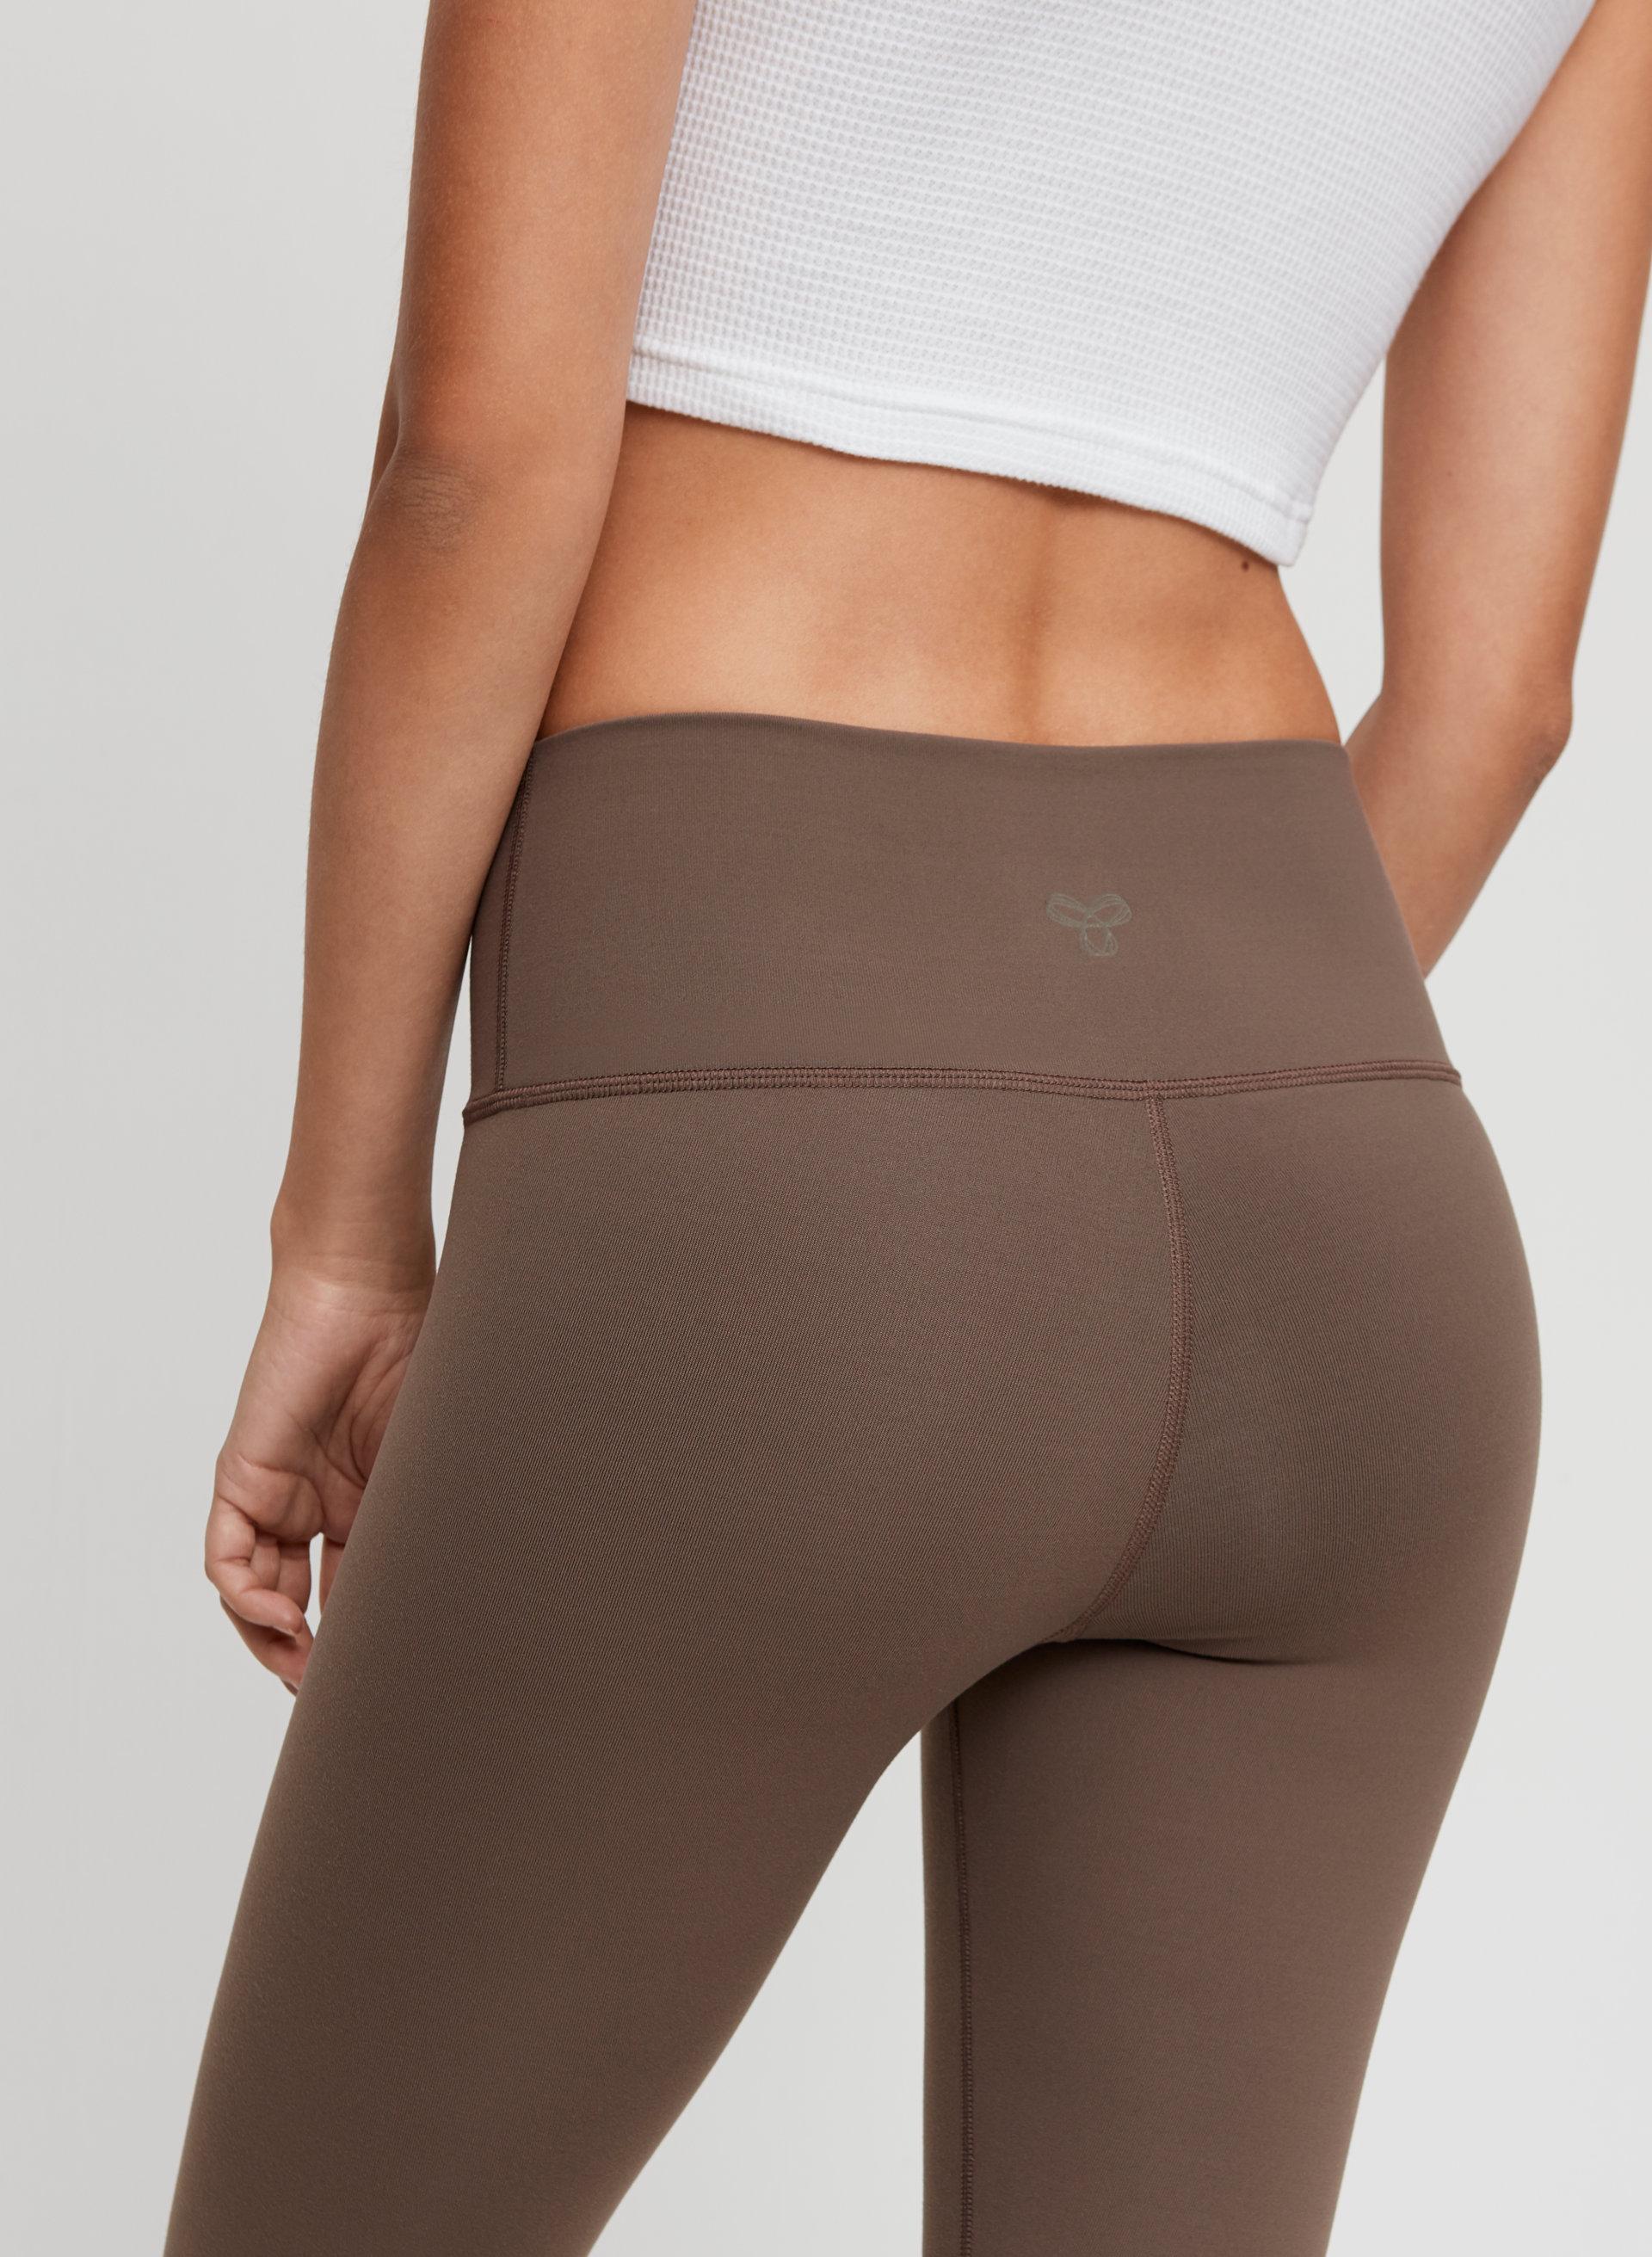 444d31239 ATMOSPHERE LEGGING - High-waisted workout legging